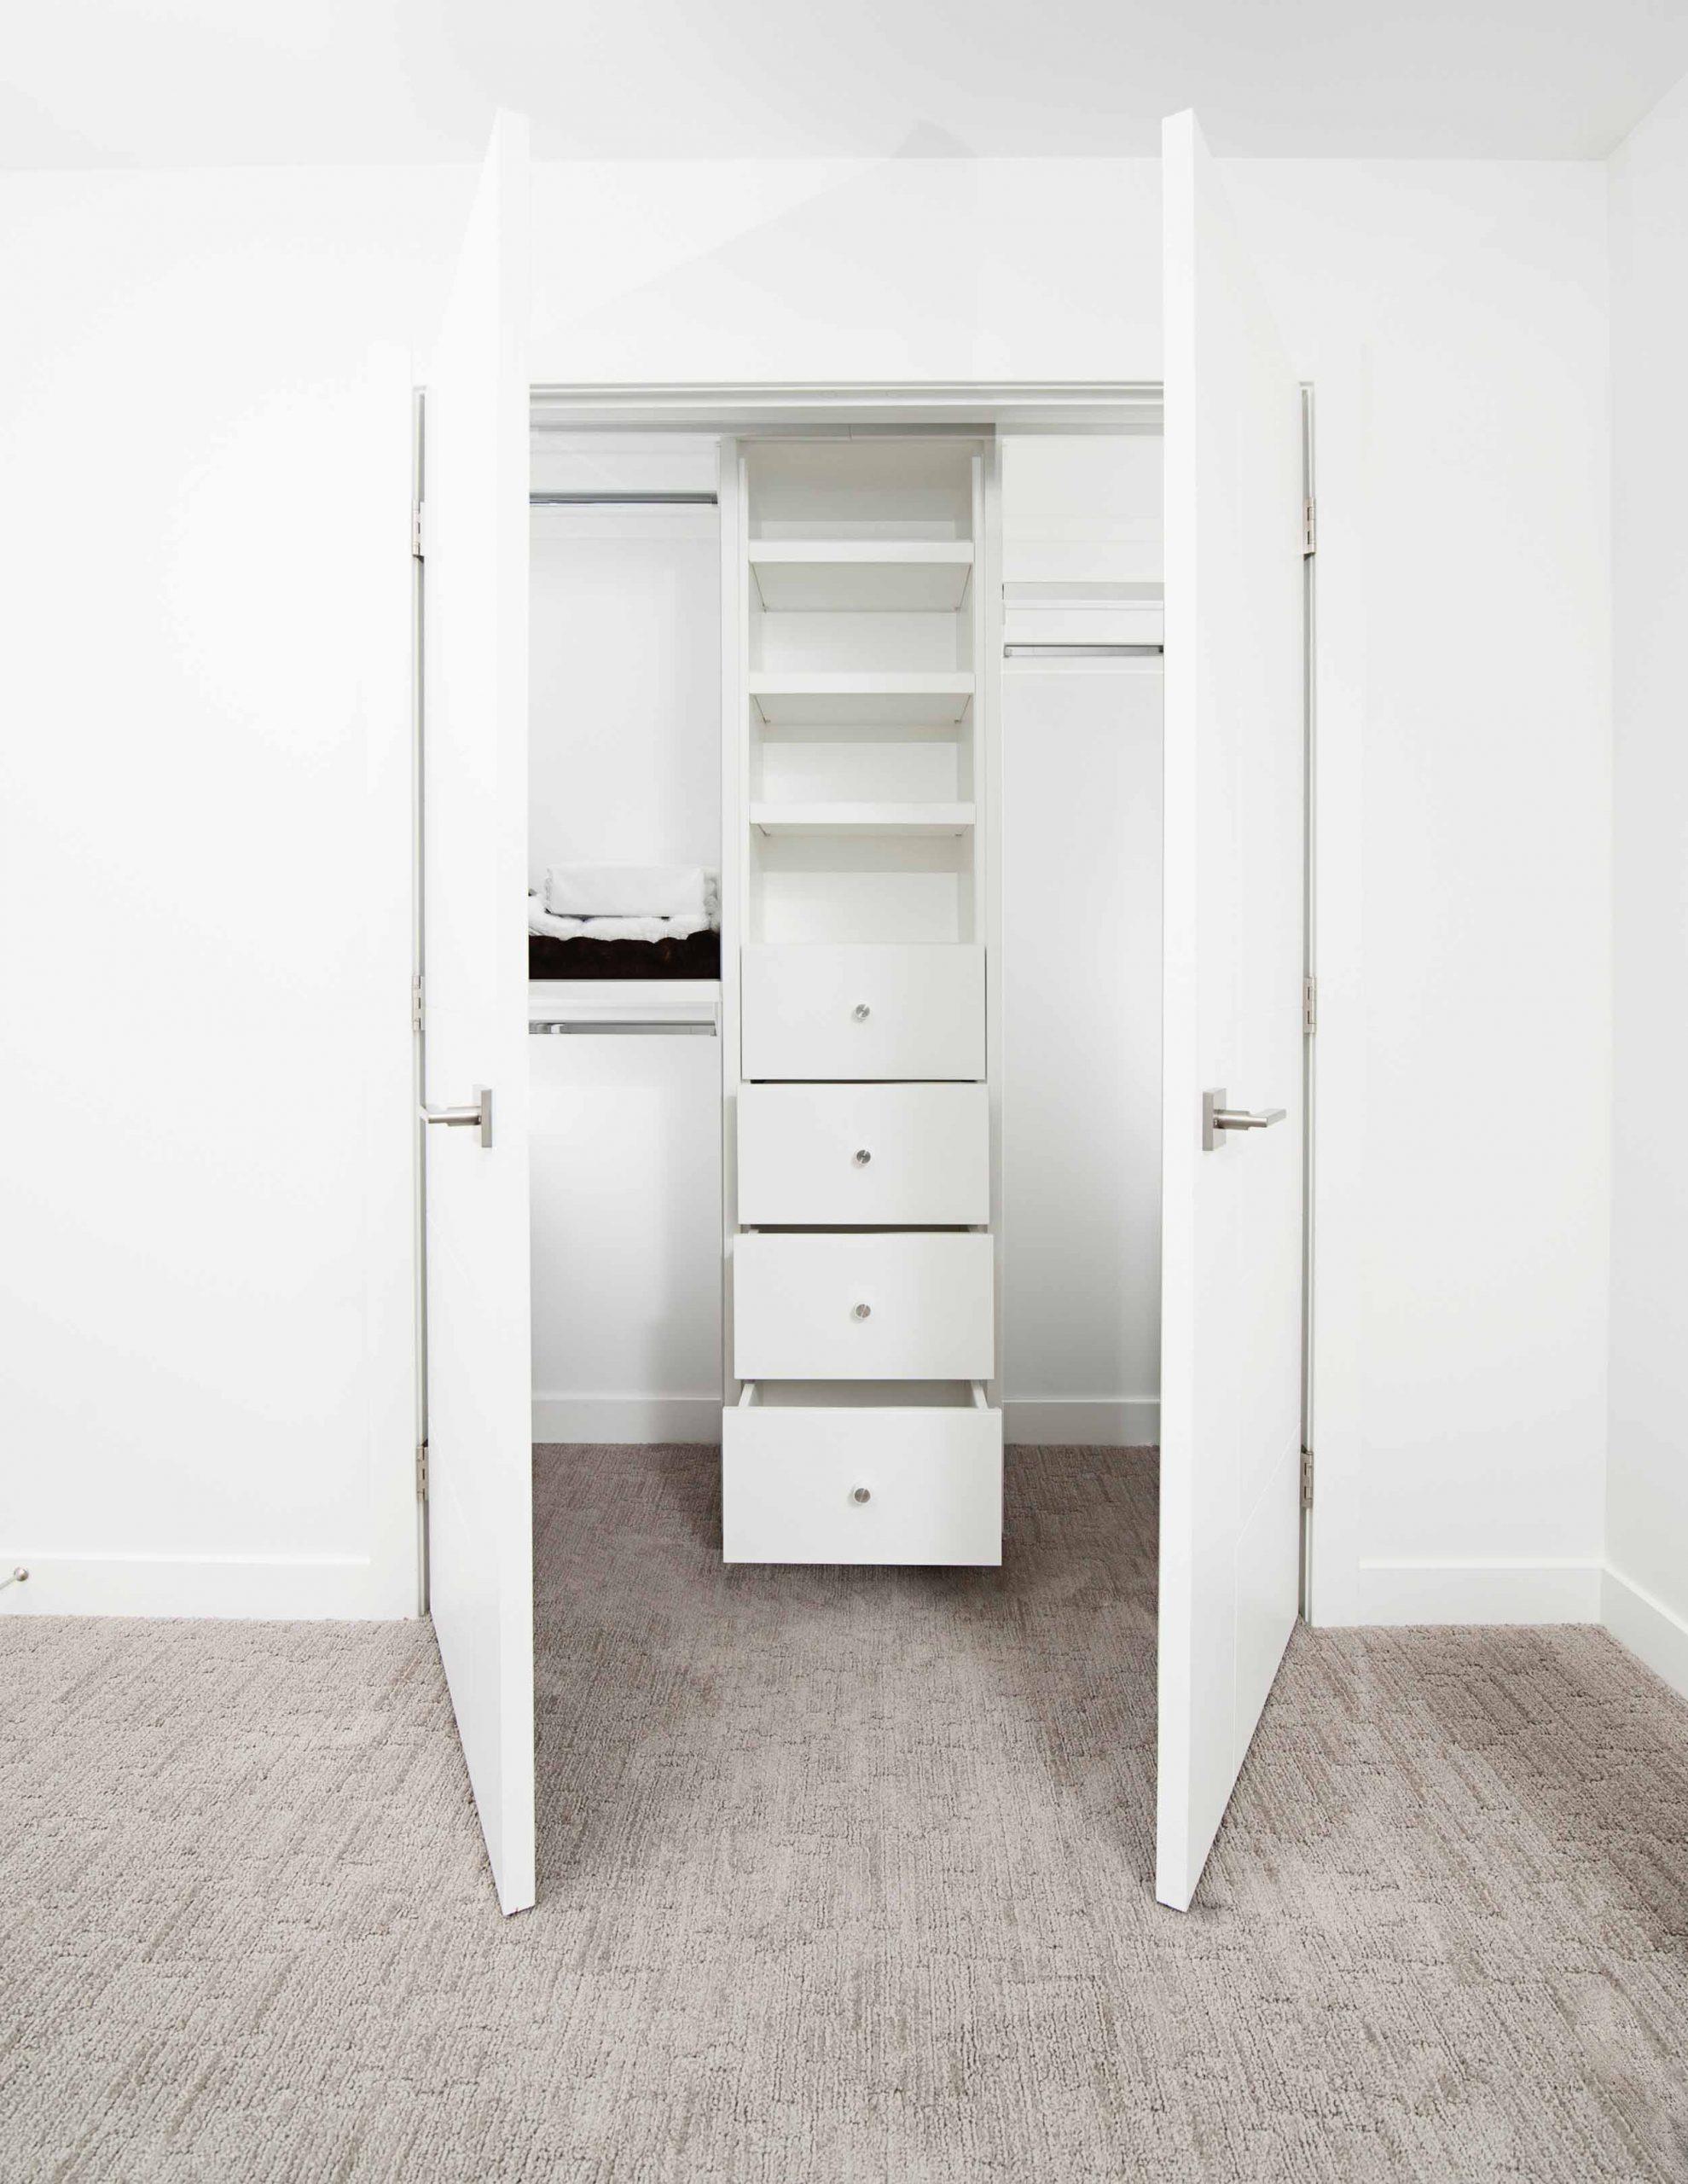 South London Carpenters - Bespoke Wardrobe